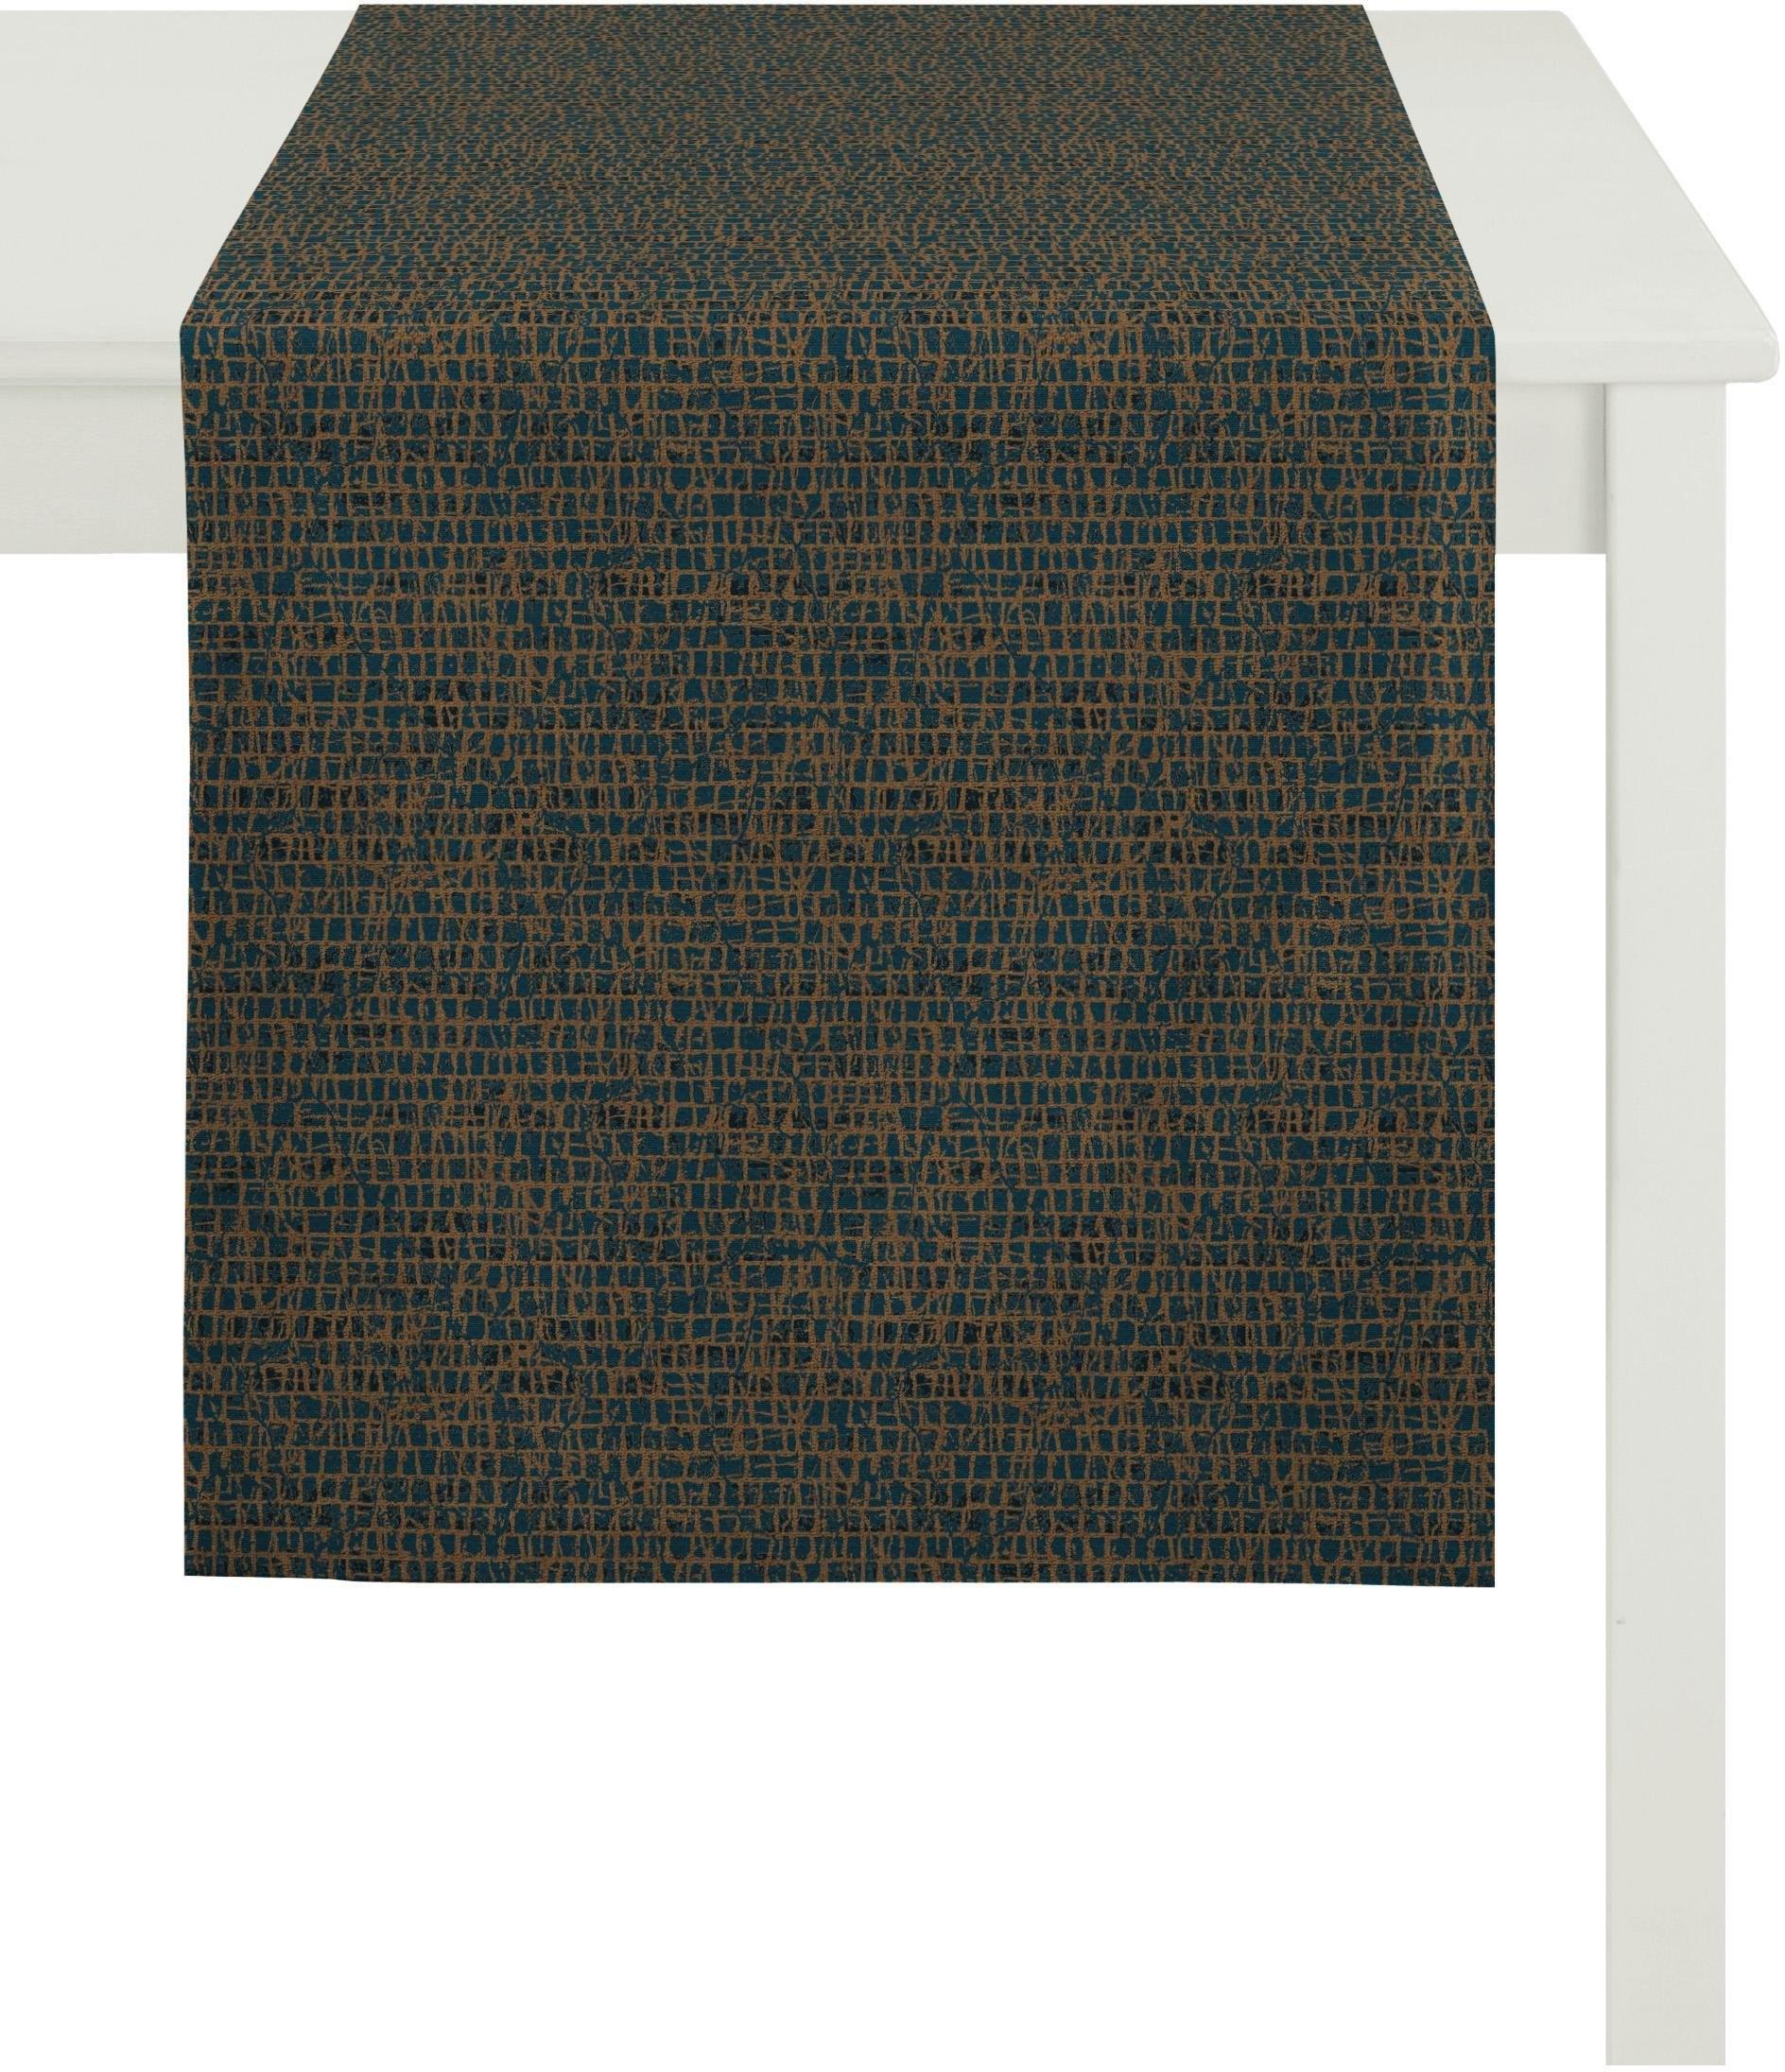 APELT tafelloper 1103 Loft Style, Jacquard (1 stuk) bestellen: 30 dagen bedenktijd